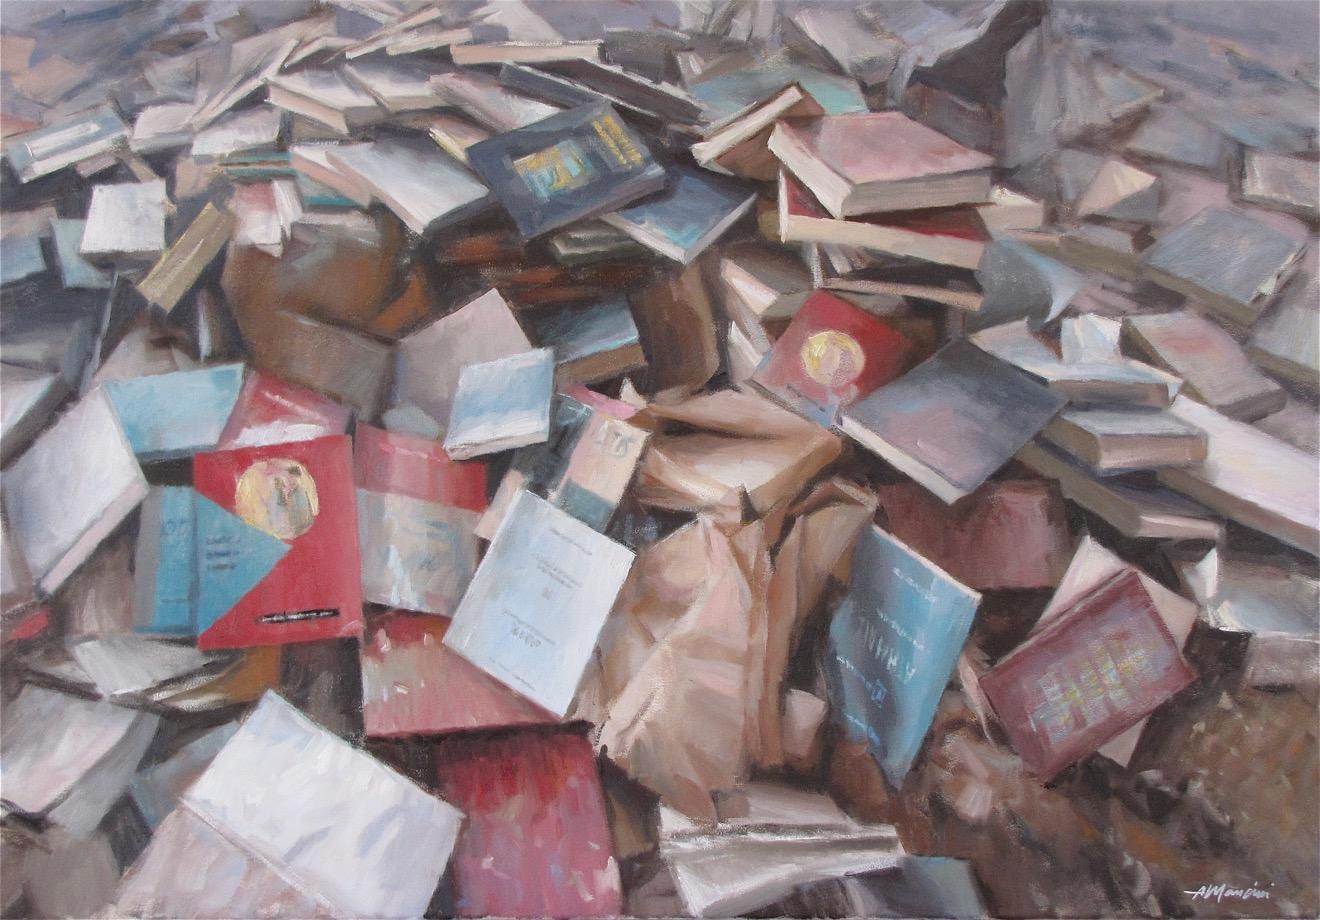 1351, Montagna di libri, 2011, olio su tela 70x100